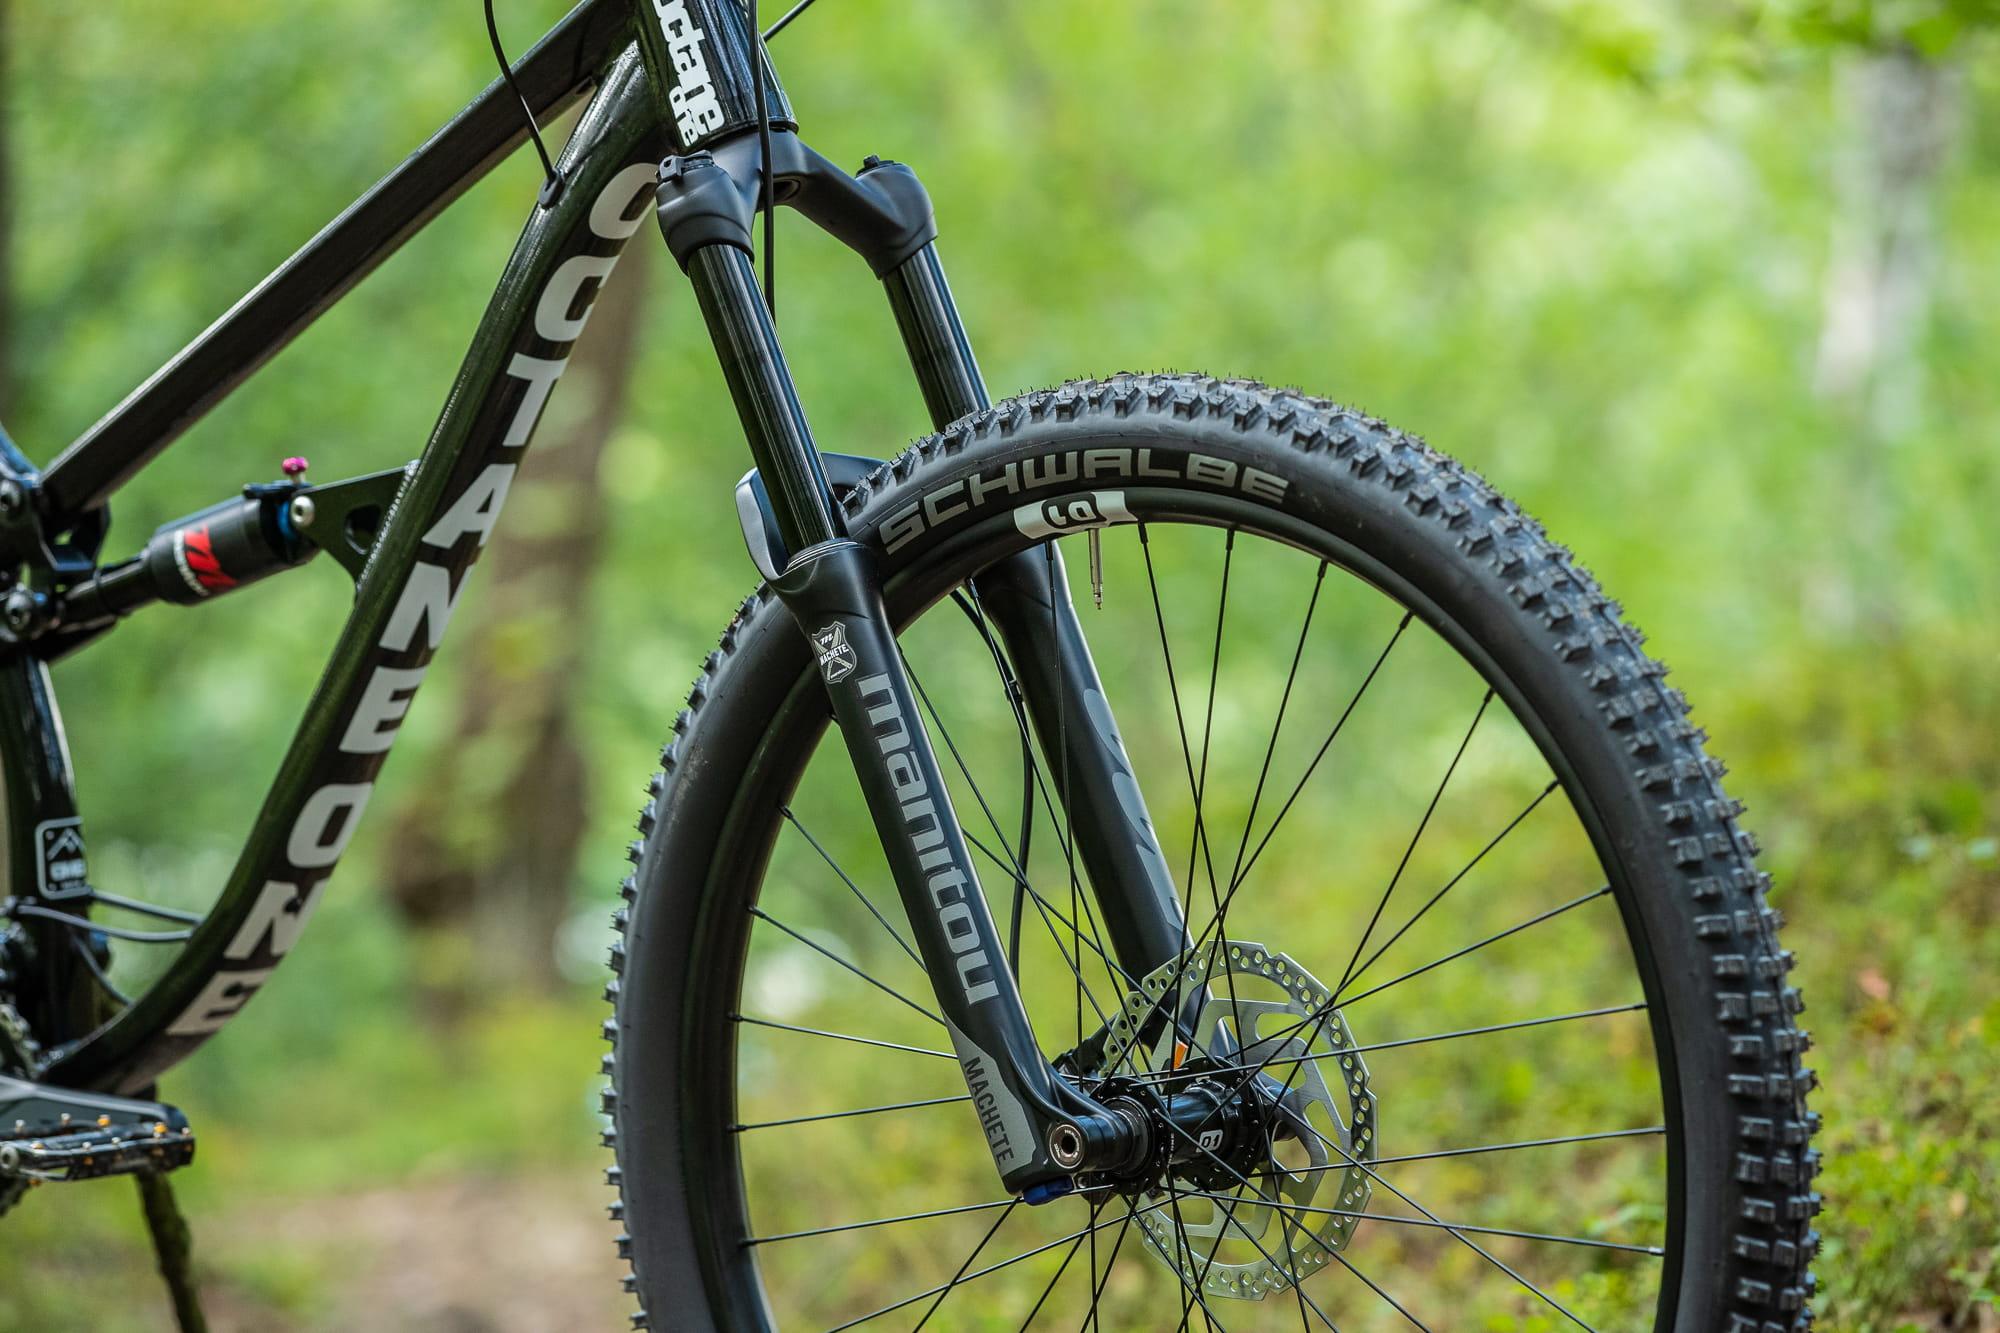 Octane-One-OMG-Bike-Mailorder-de-4